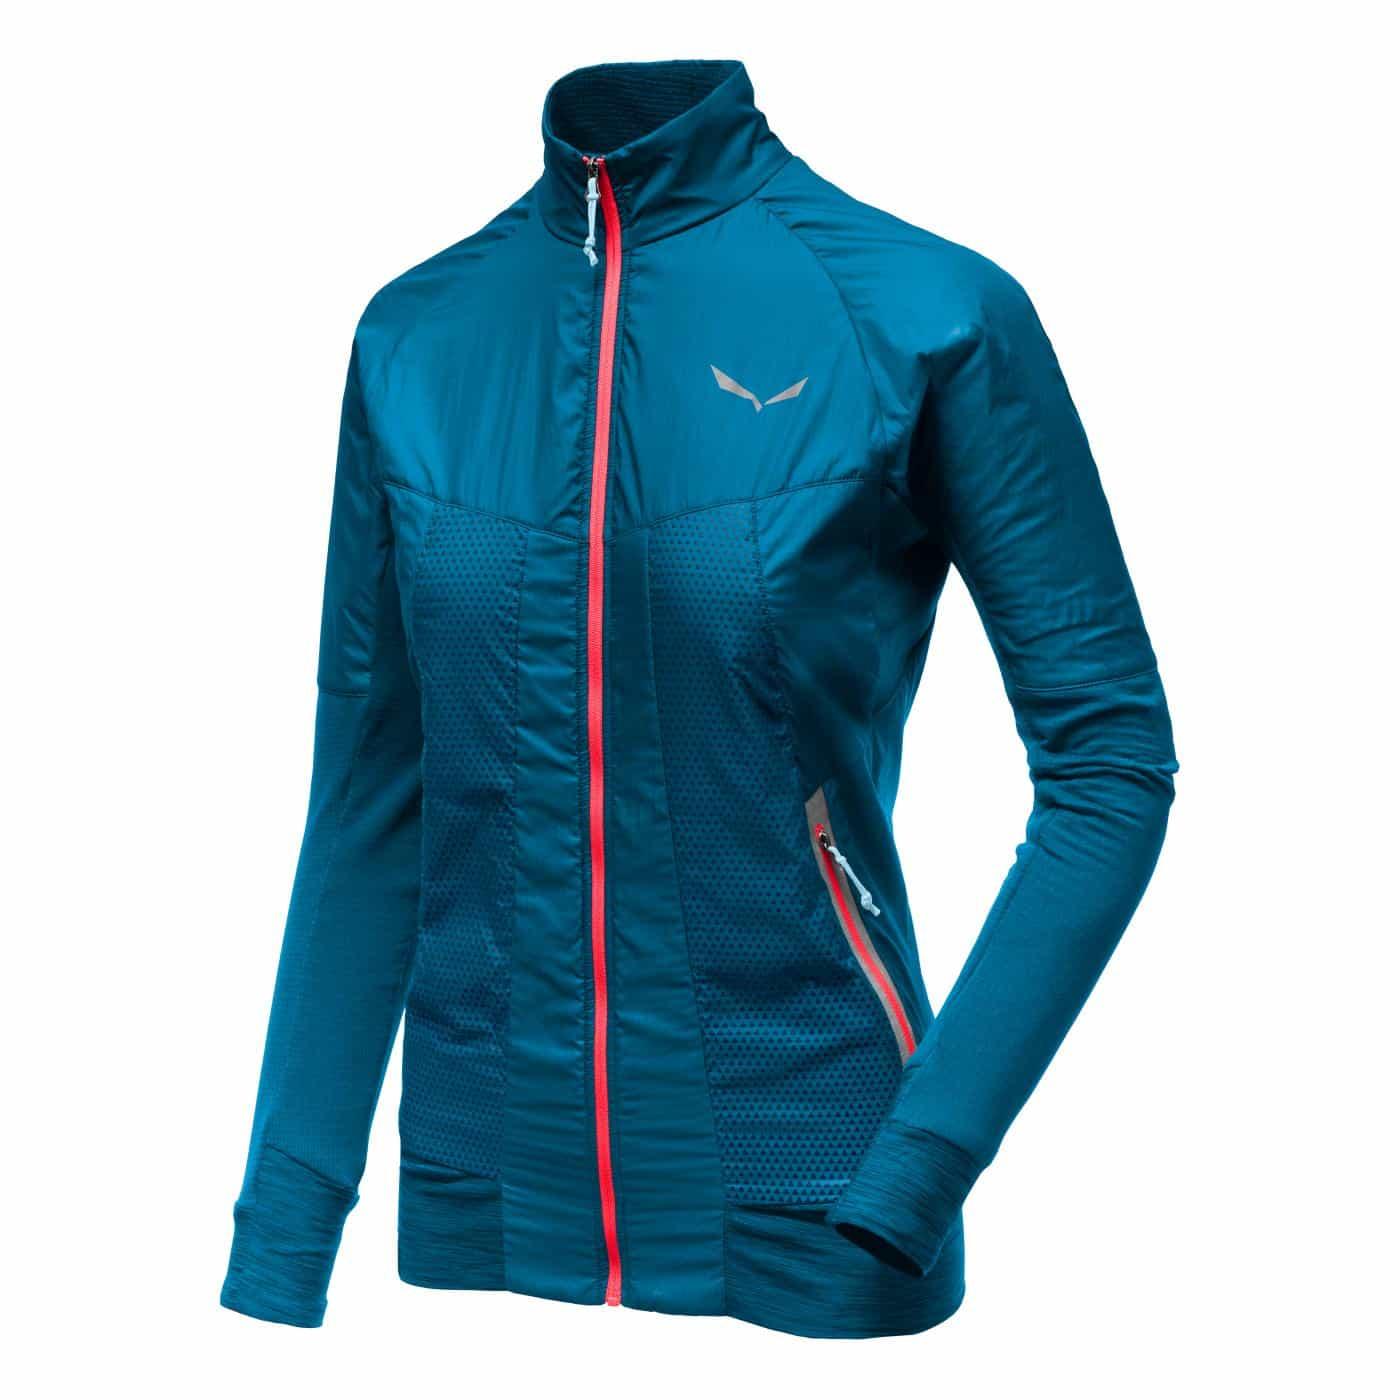 Salewa-Pedroc Hybrid Polartec Alpha Jacket - Women's